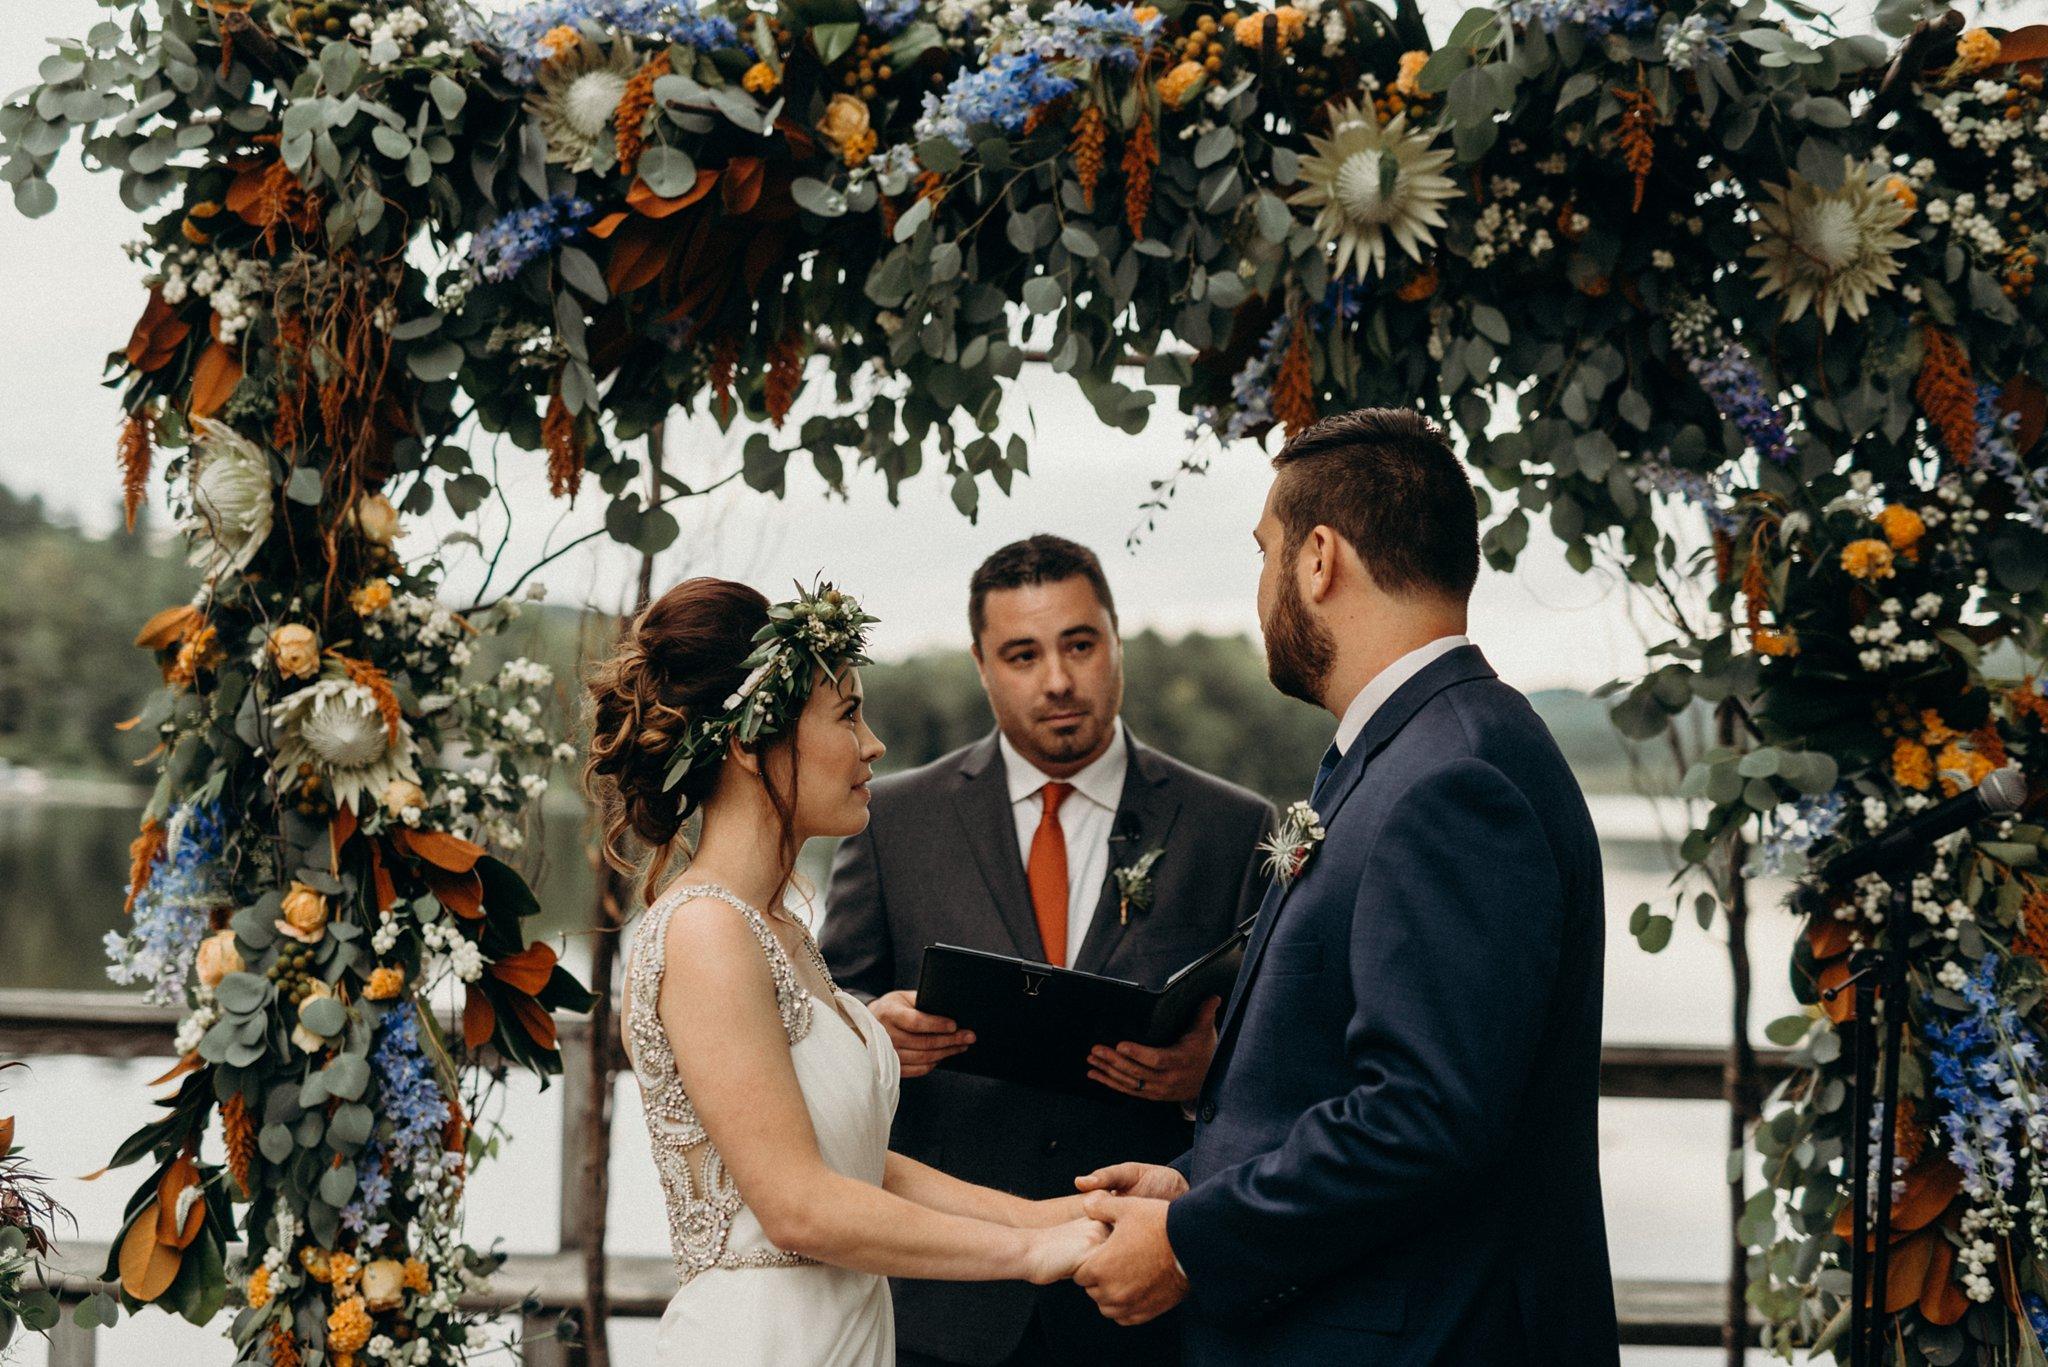 kaihla_tonai_intimate_wedding_elopement_photographer_6636.jpg